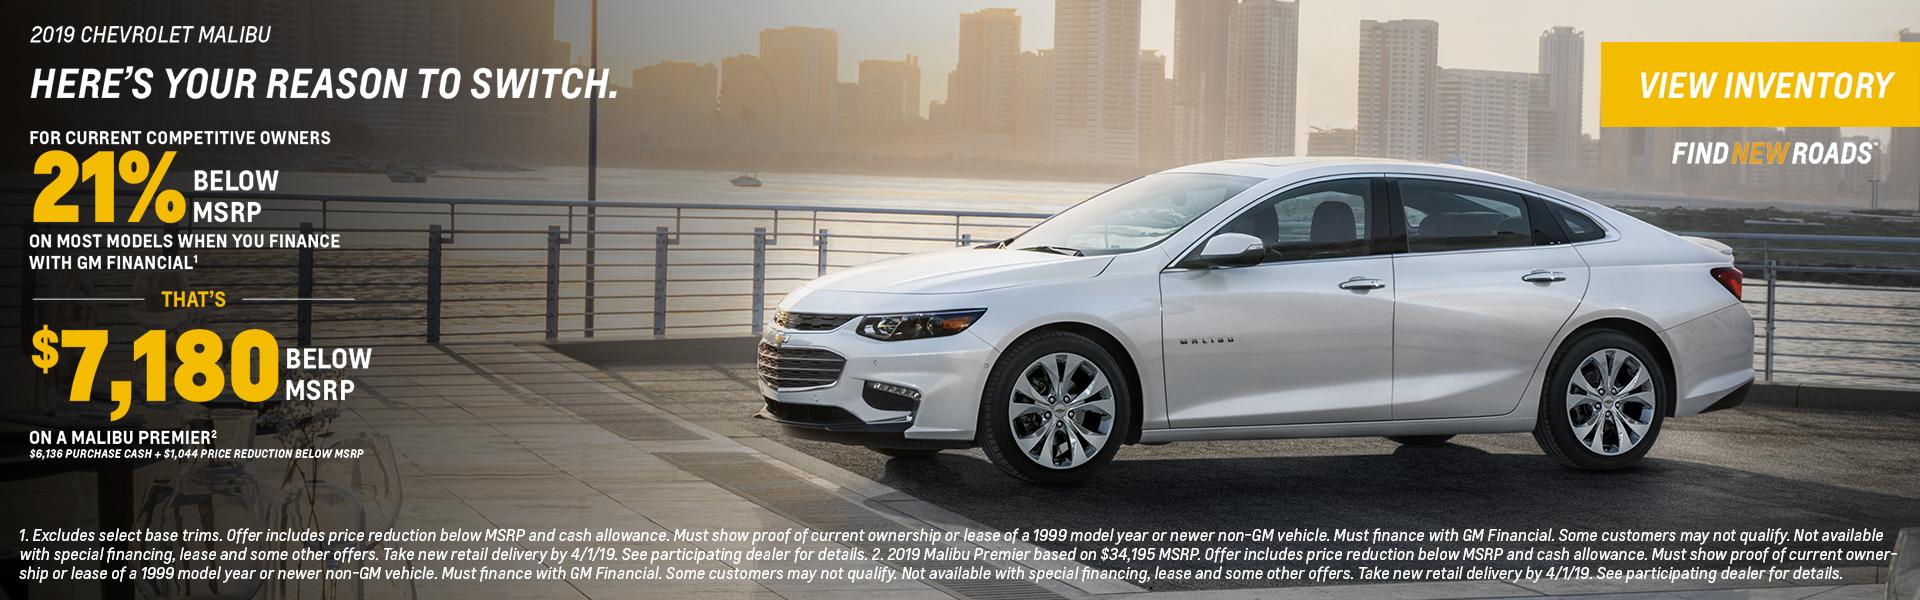 New & Used Chevrolet Dealer | Cerritos, Whittier, El Monte ...